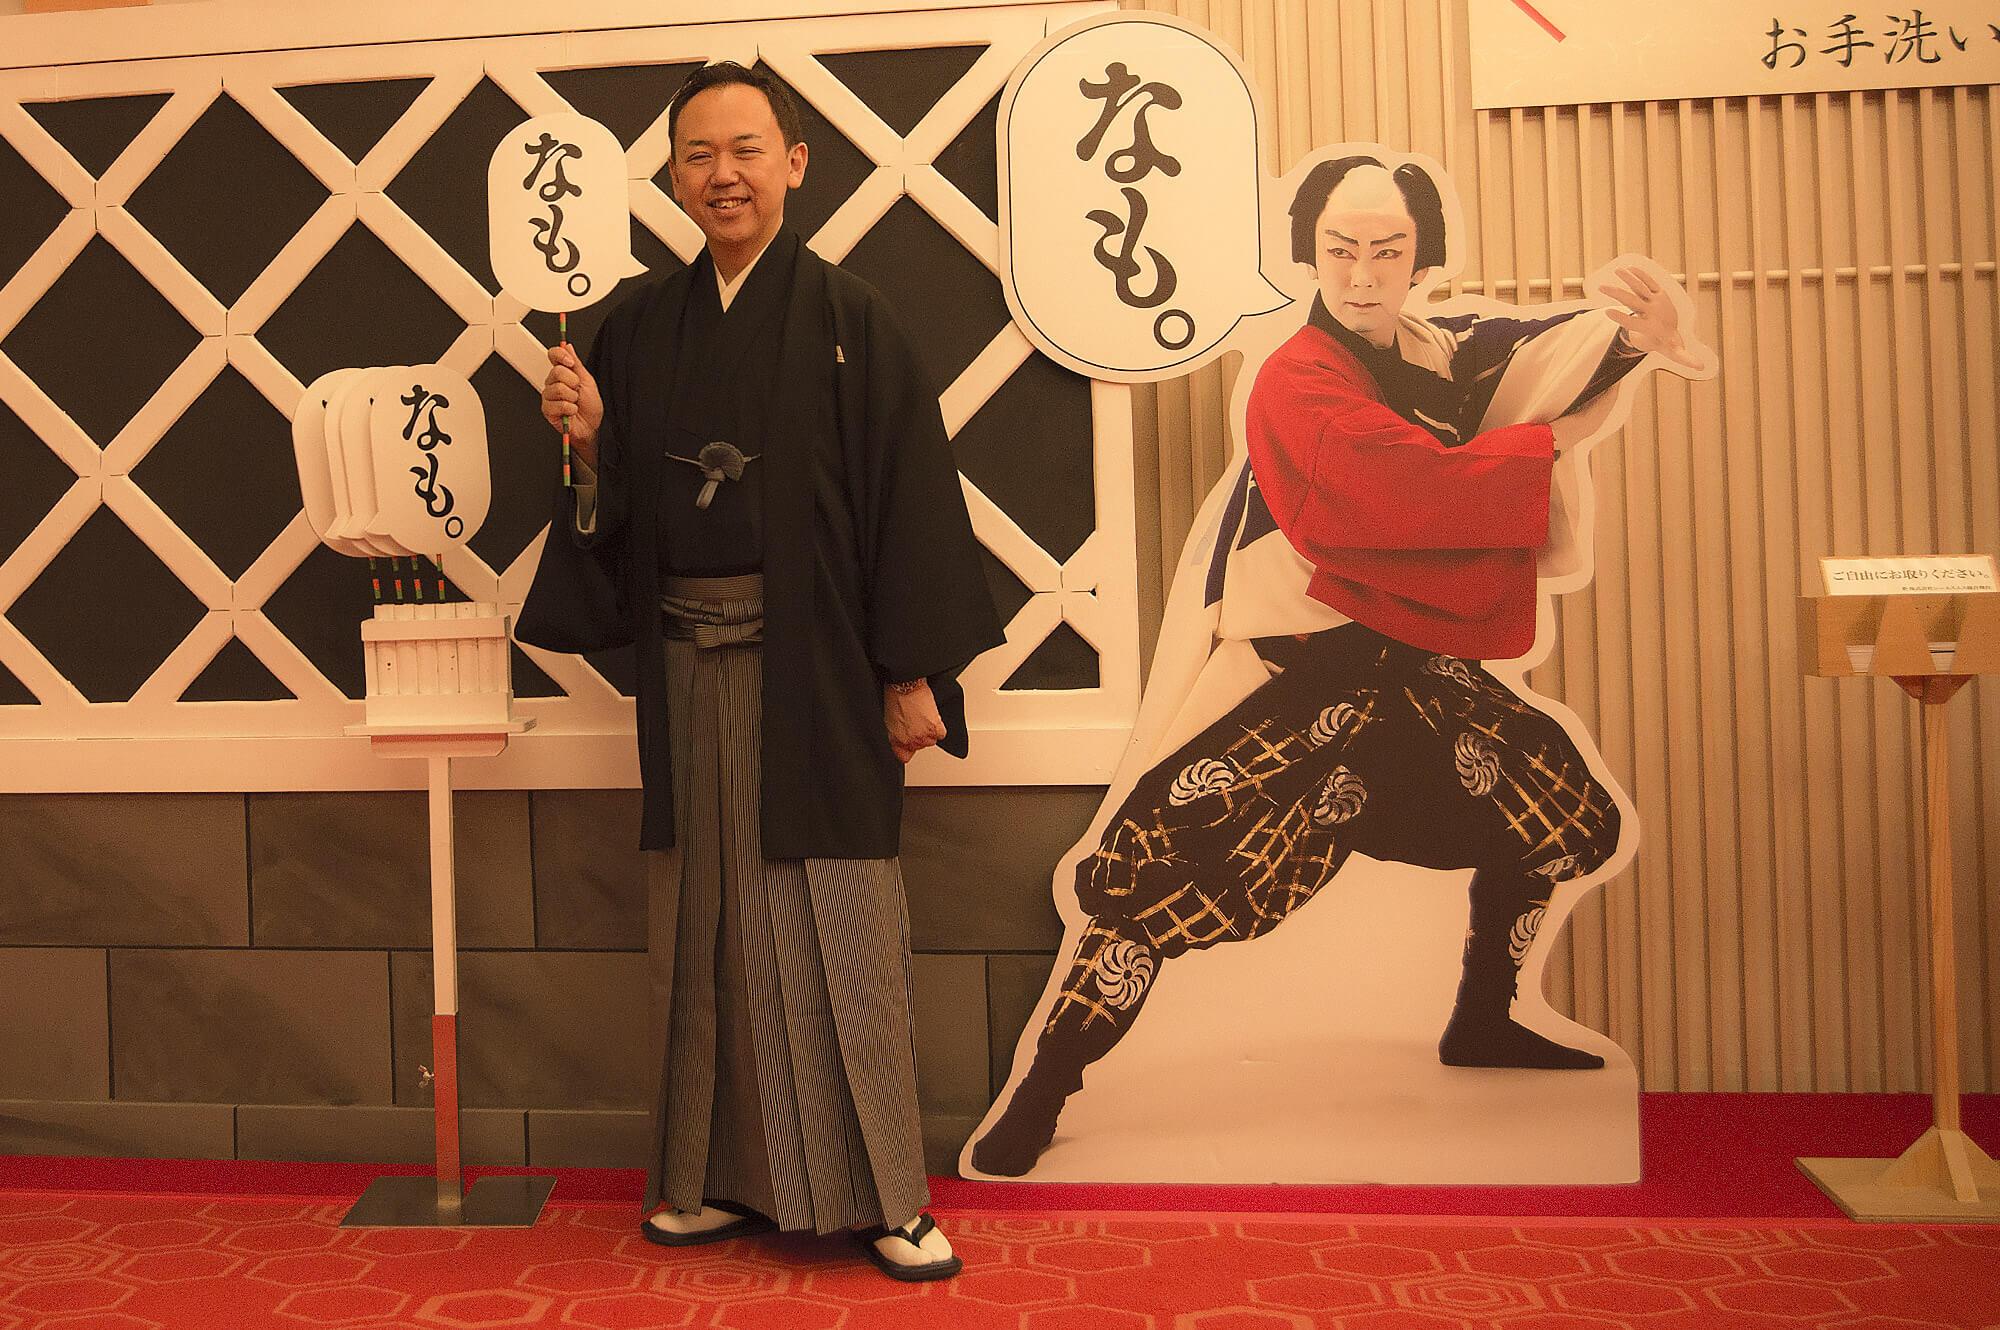 Nishikawa Kazumasa